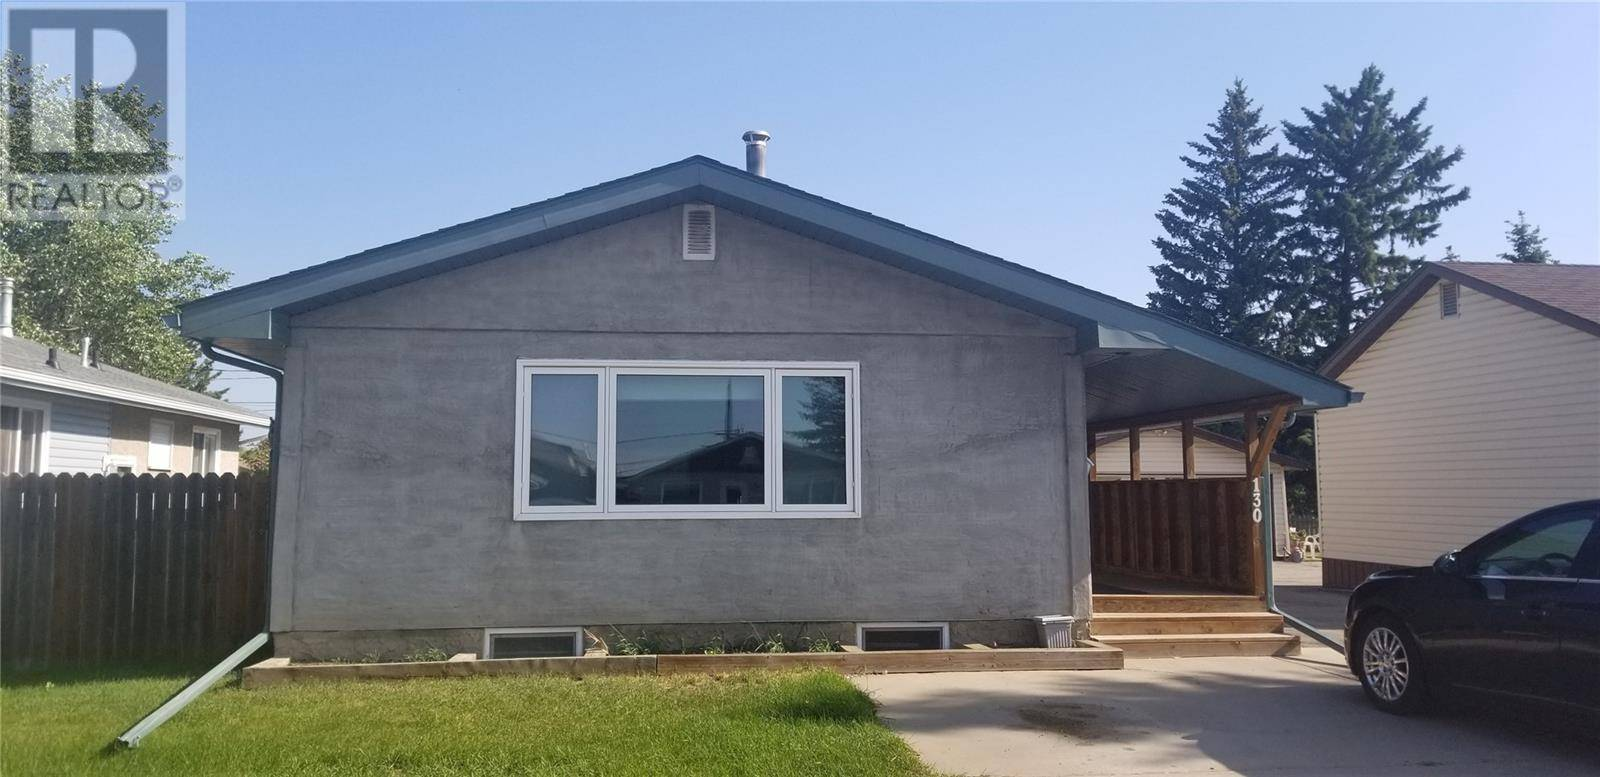 House for sale at 130 31st St W Prince Albert Saskatchewan - MLS: SK777301